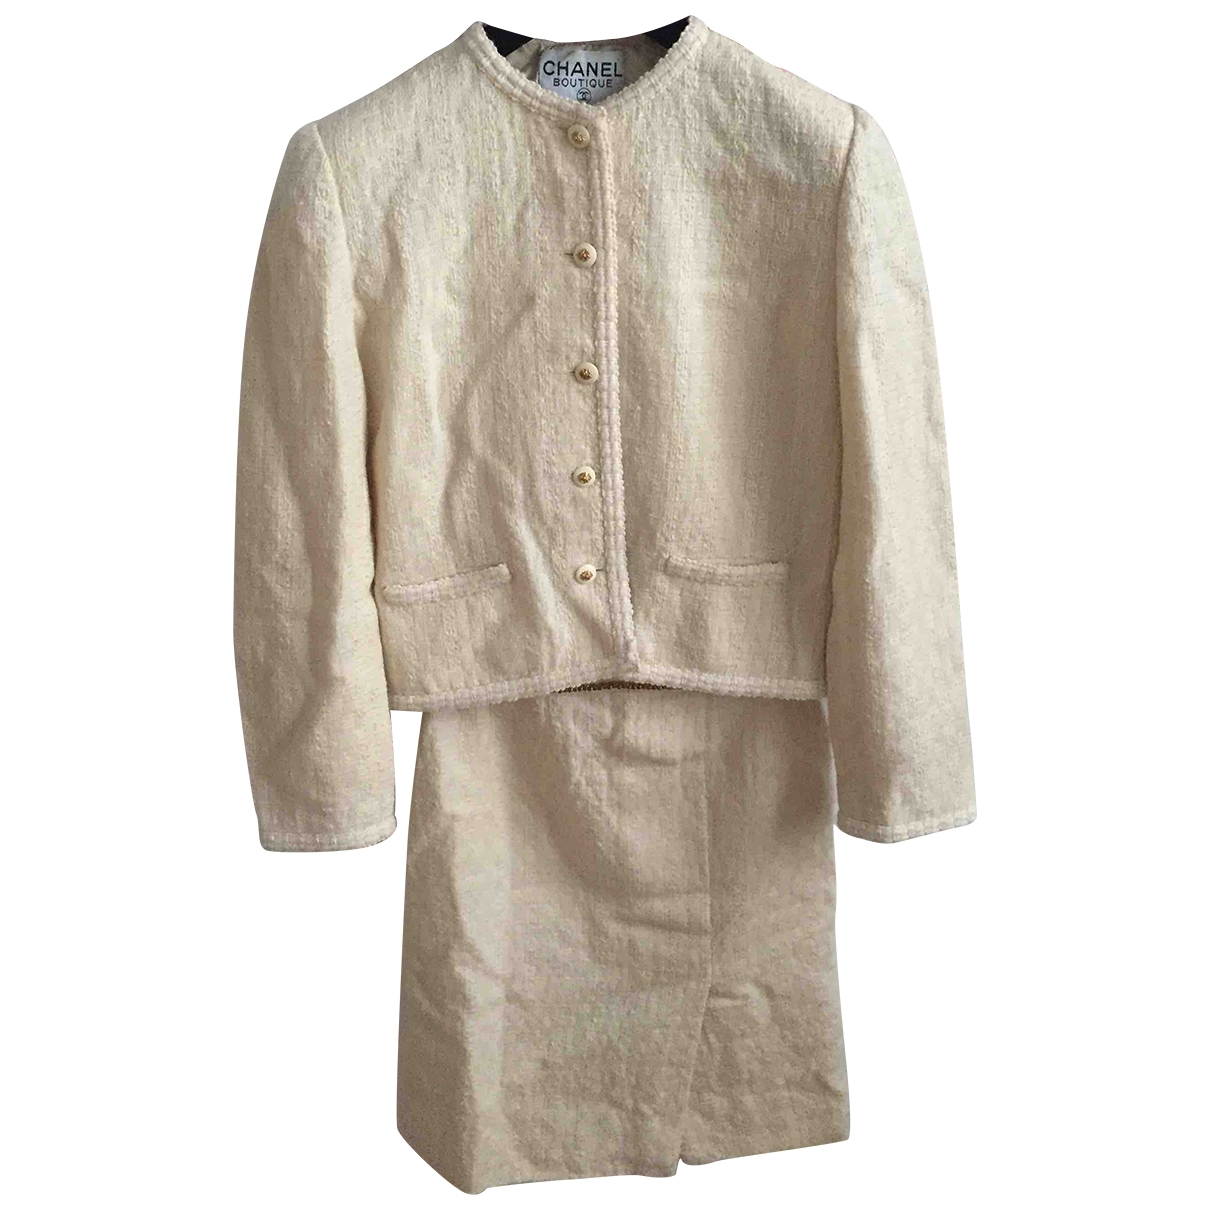 Chanel \N Ecru Tweed jacket for Women 36 FR